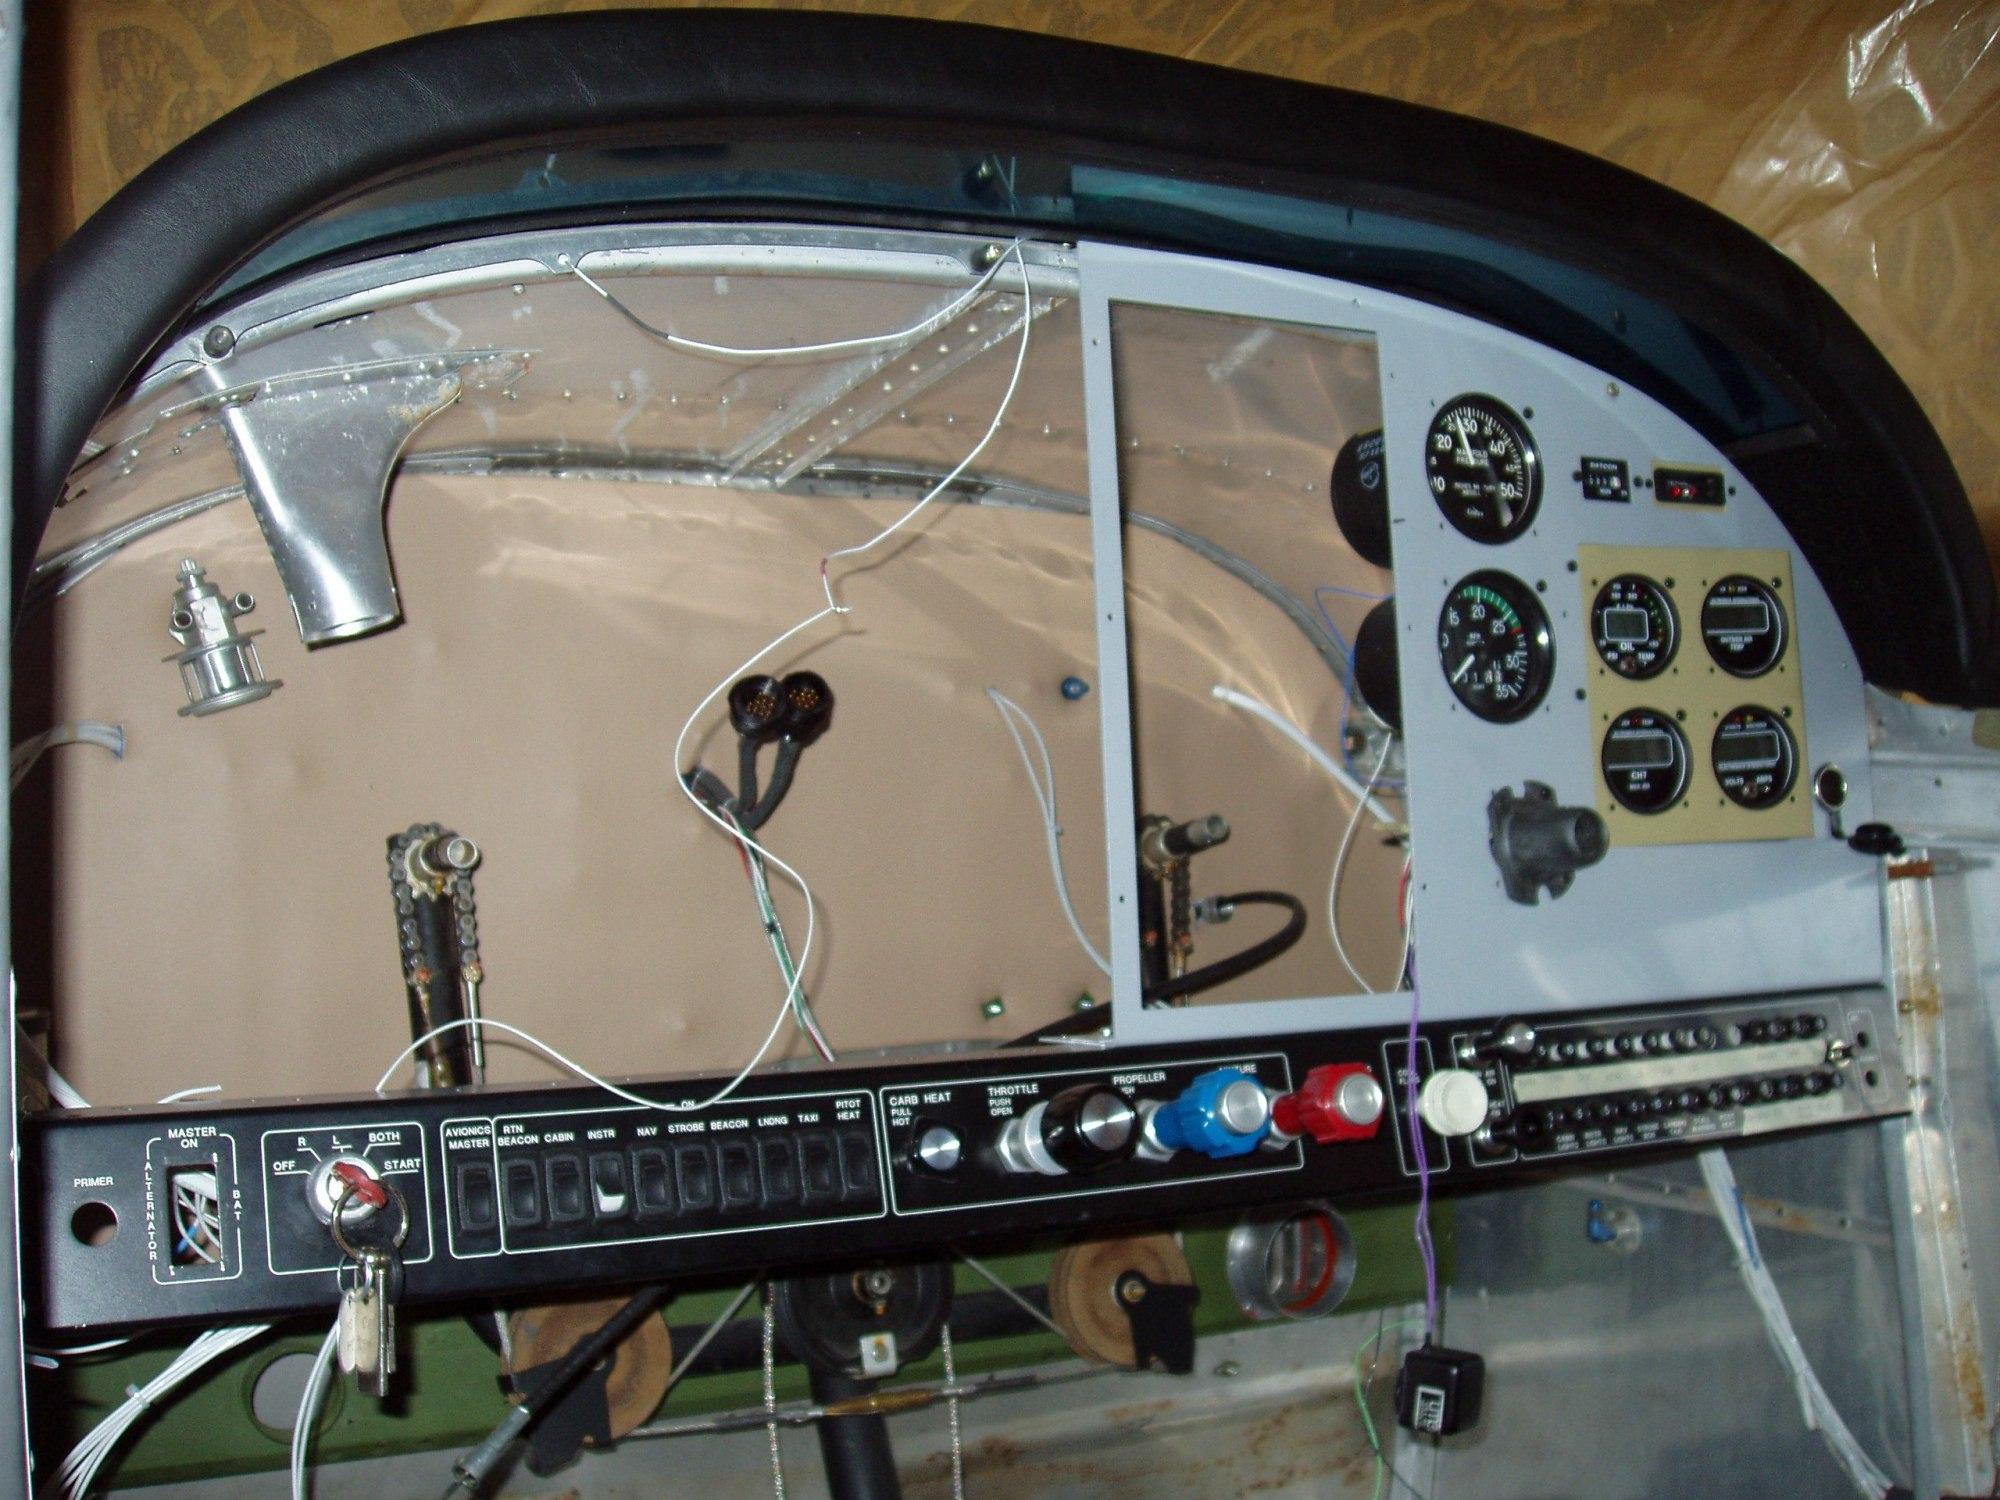 hight resolution of cessna 180 skywagon restoration tailwheel cessna 180 skywagon instrument panel under restoriation tailwheel